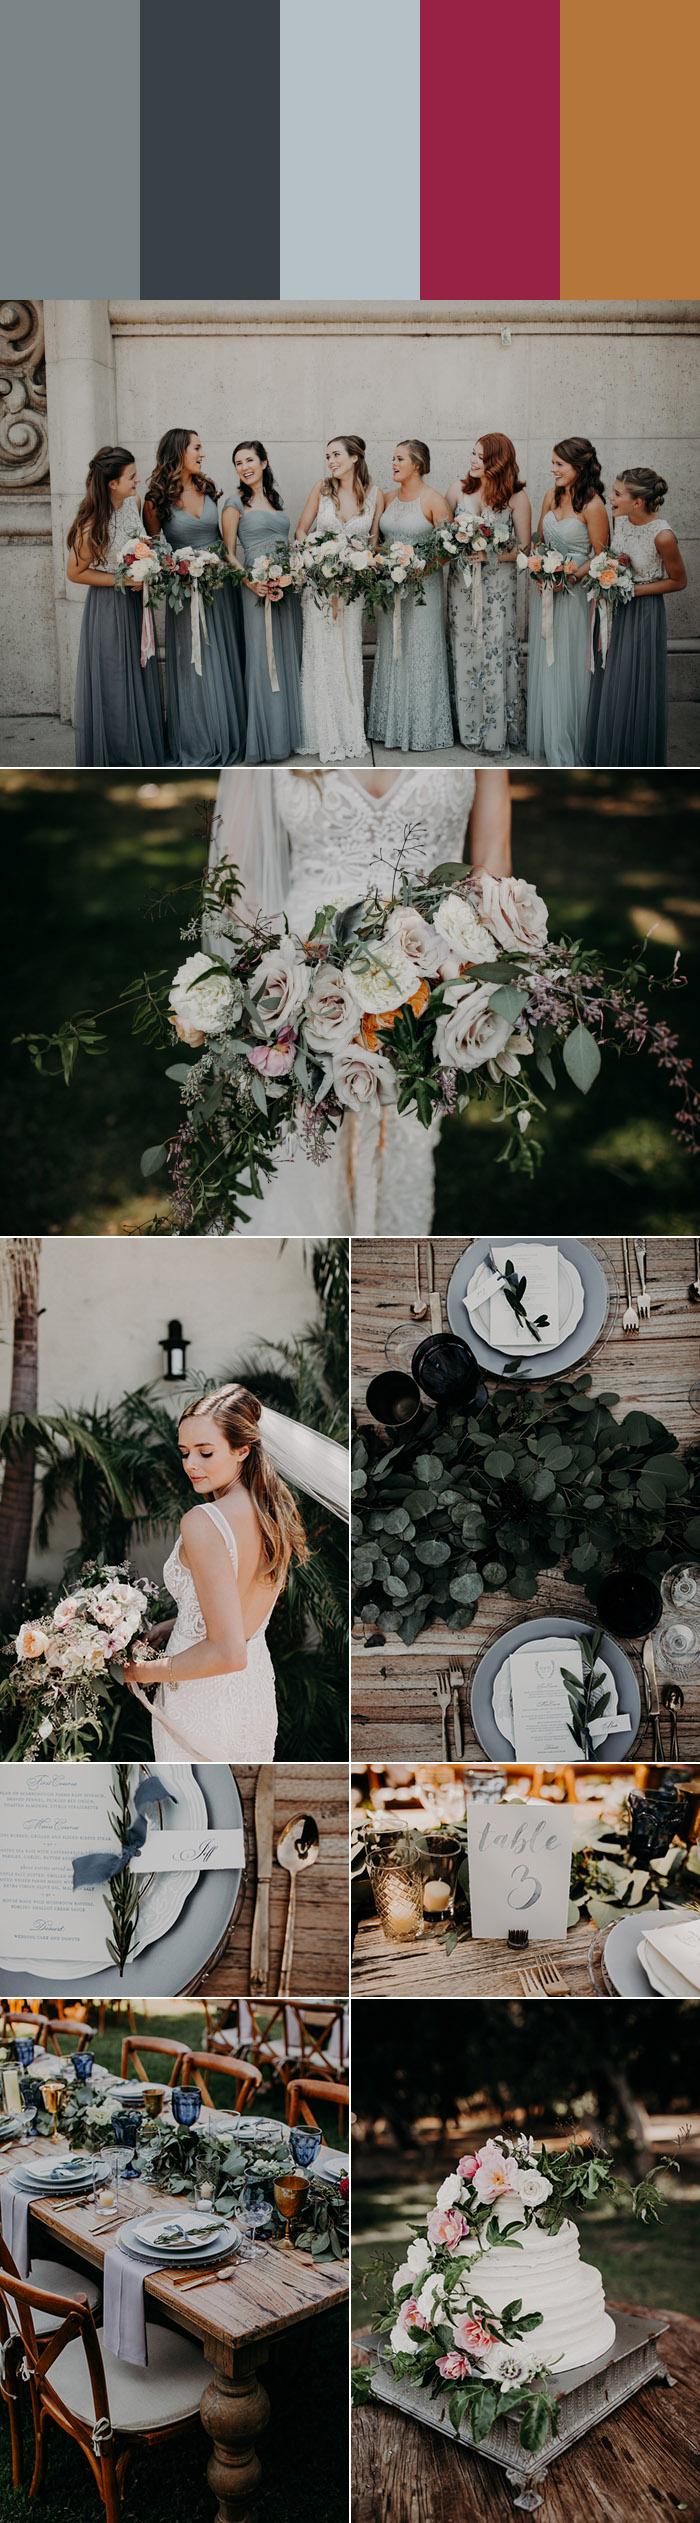 f10c020315 Wedding Blog for Real Wedding Ideas   Inspiration